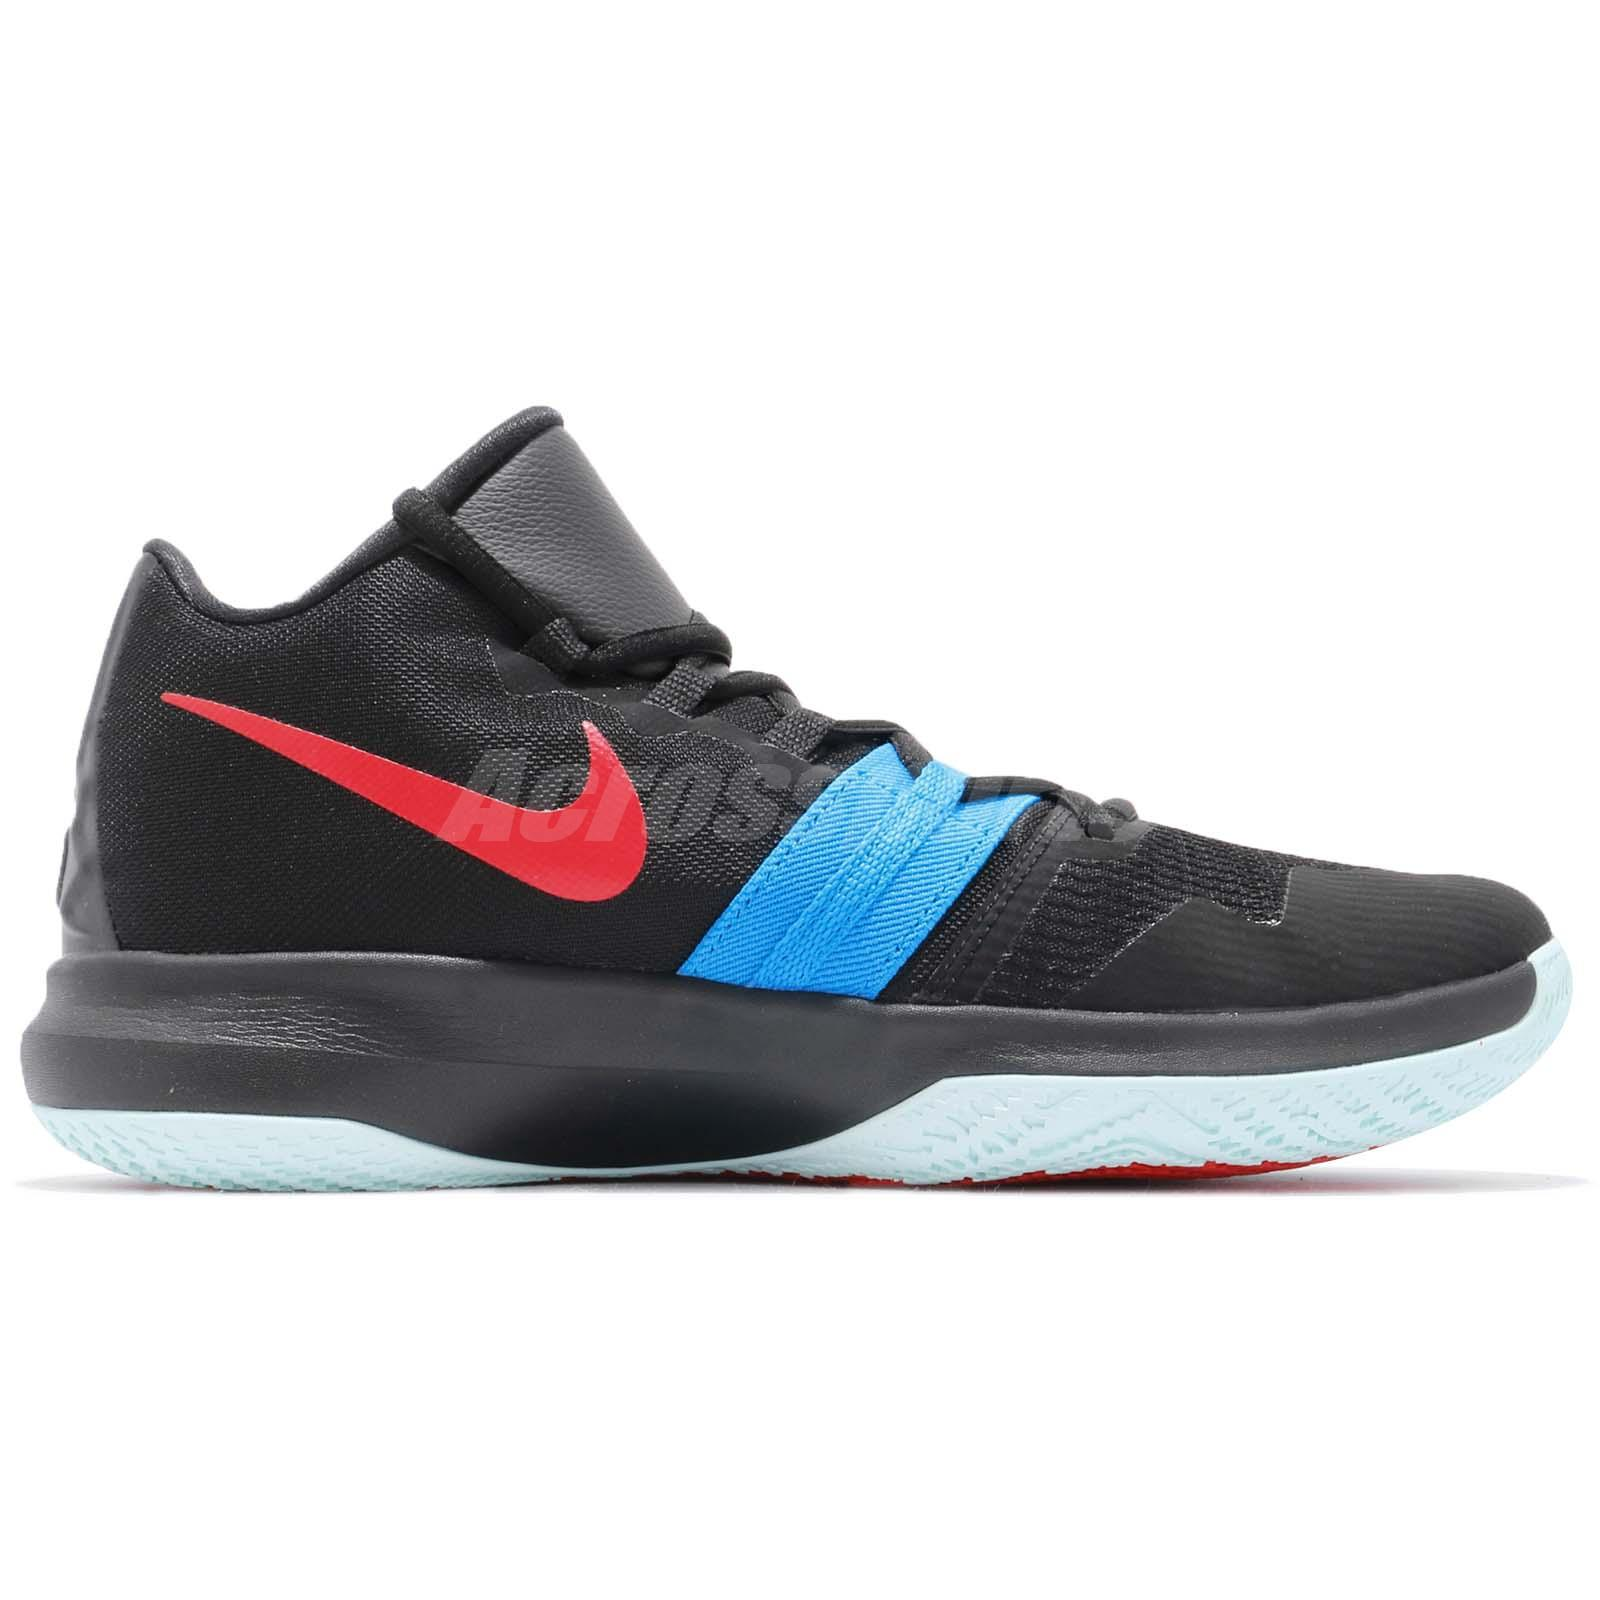 Nike Kyrie Flytrap EP Irving Black Blue Red Men Basketball Shoes ... 6ca855d9472